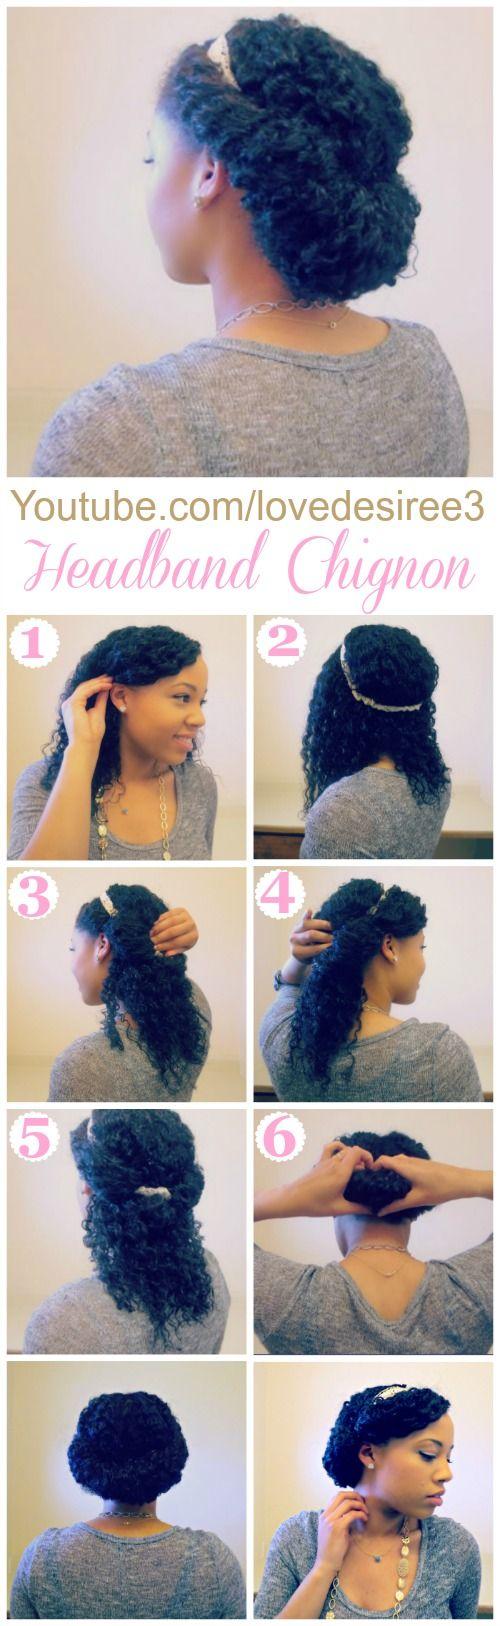 ManeGuru.com  Natural Hairstyles: Bantu Knots, Afros, Twist outs, Protective Styles   Visit ManeGuru.com for more!